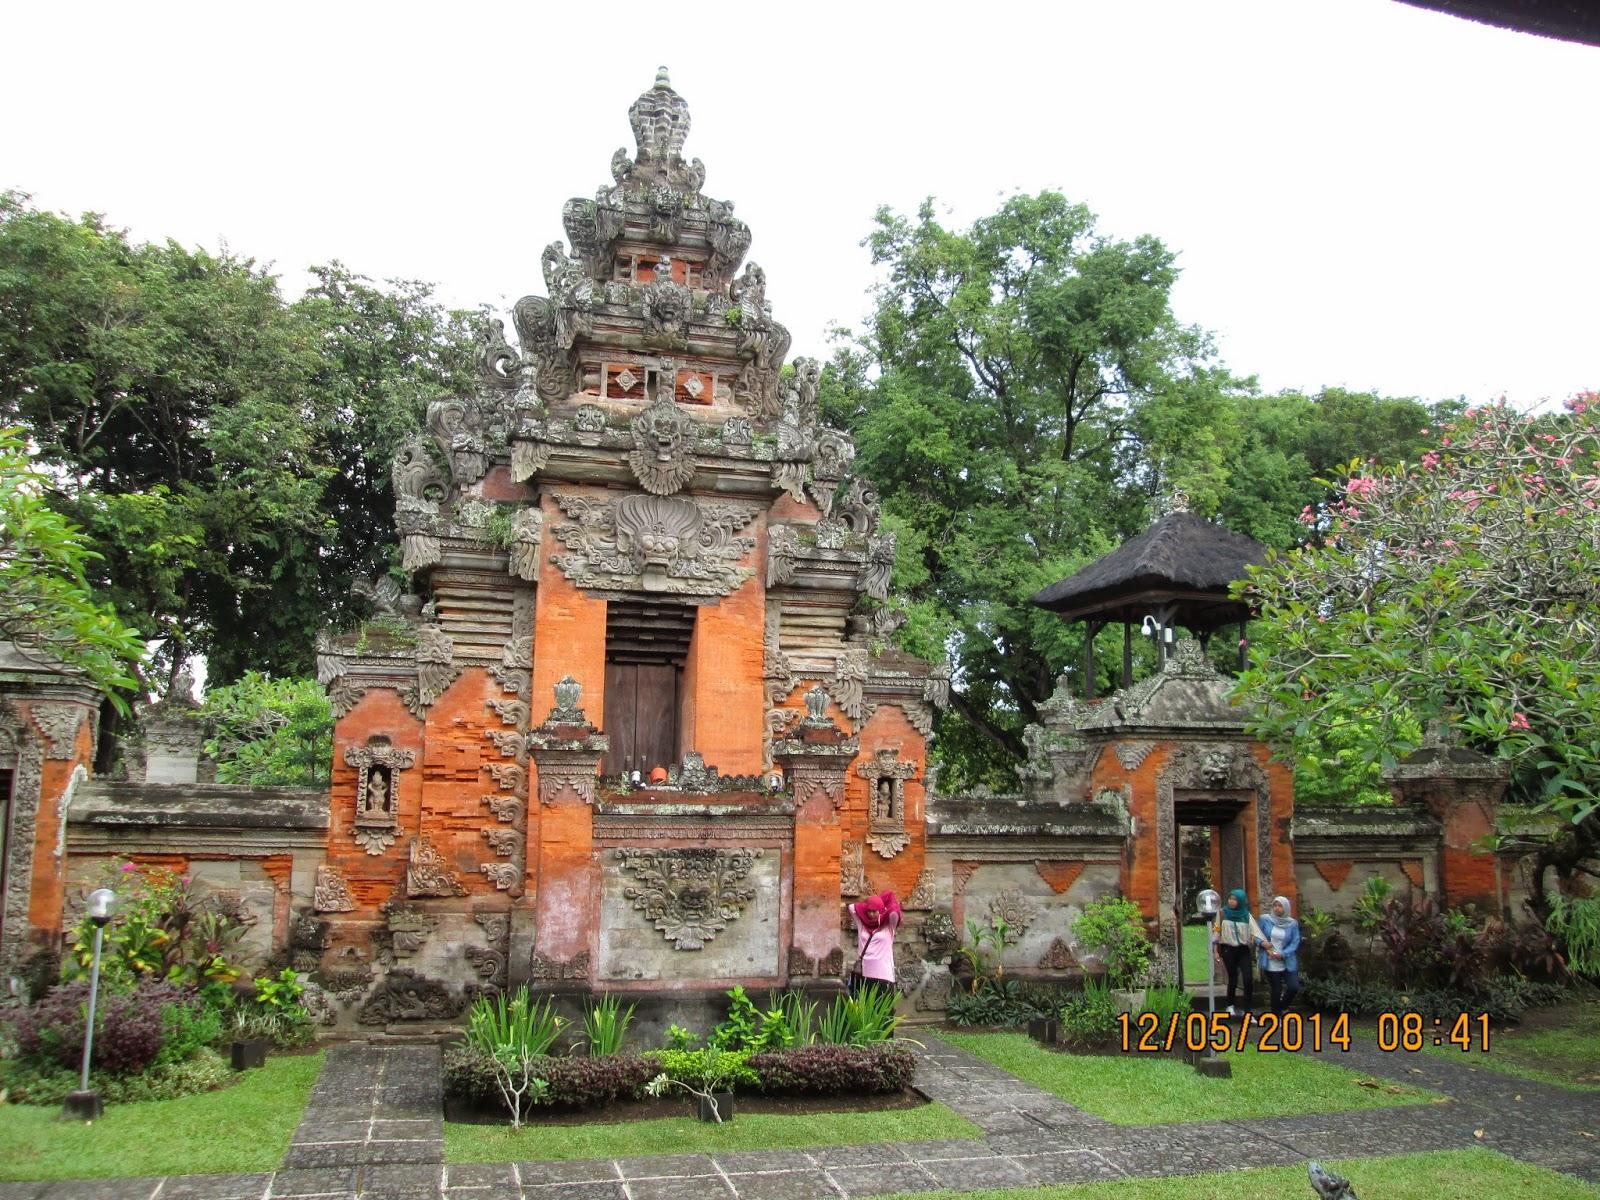 Ketika Bali Memberikan Kesan Desi Blog Museum Denpasar Terletak Jantung